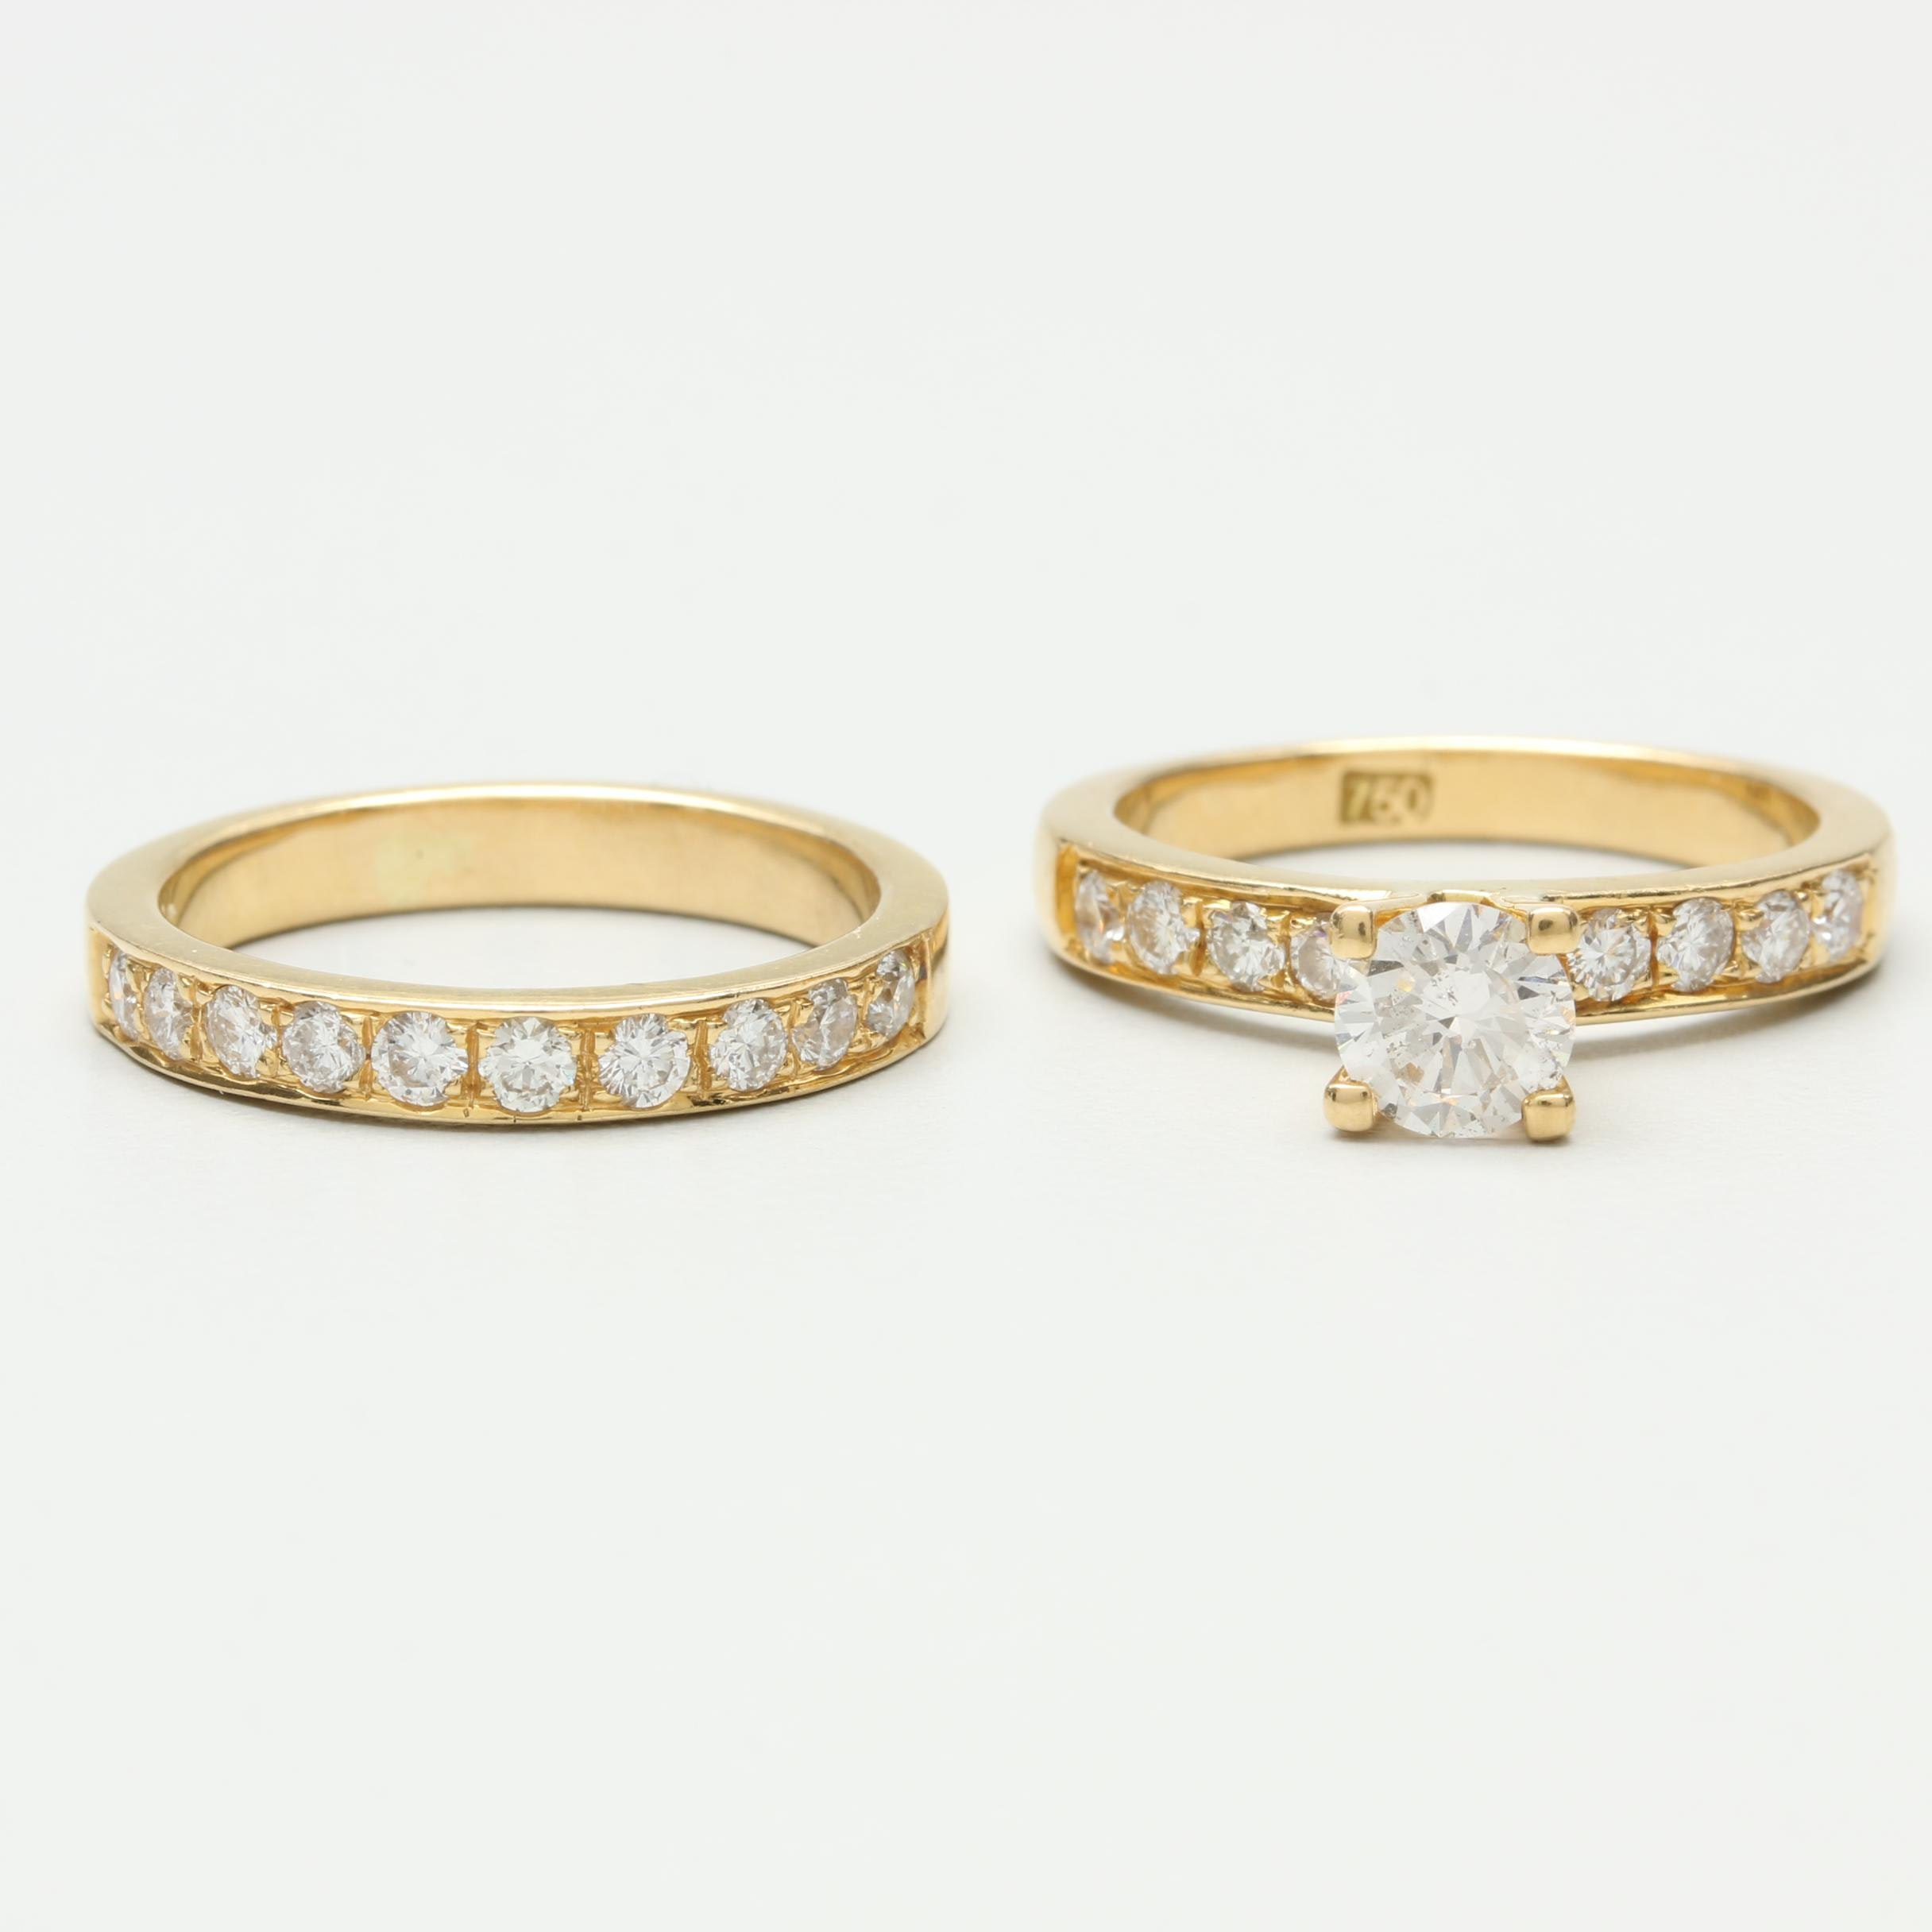 18K Yellow Gold Diamond 1.28 CTW Diamond Ring Set